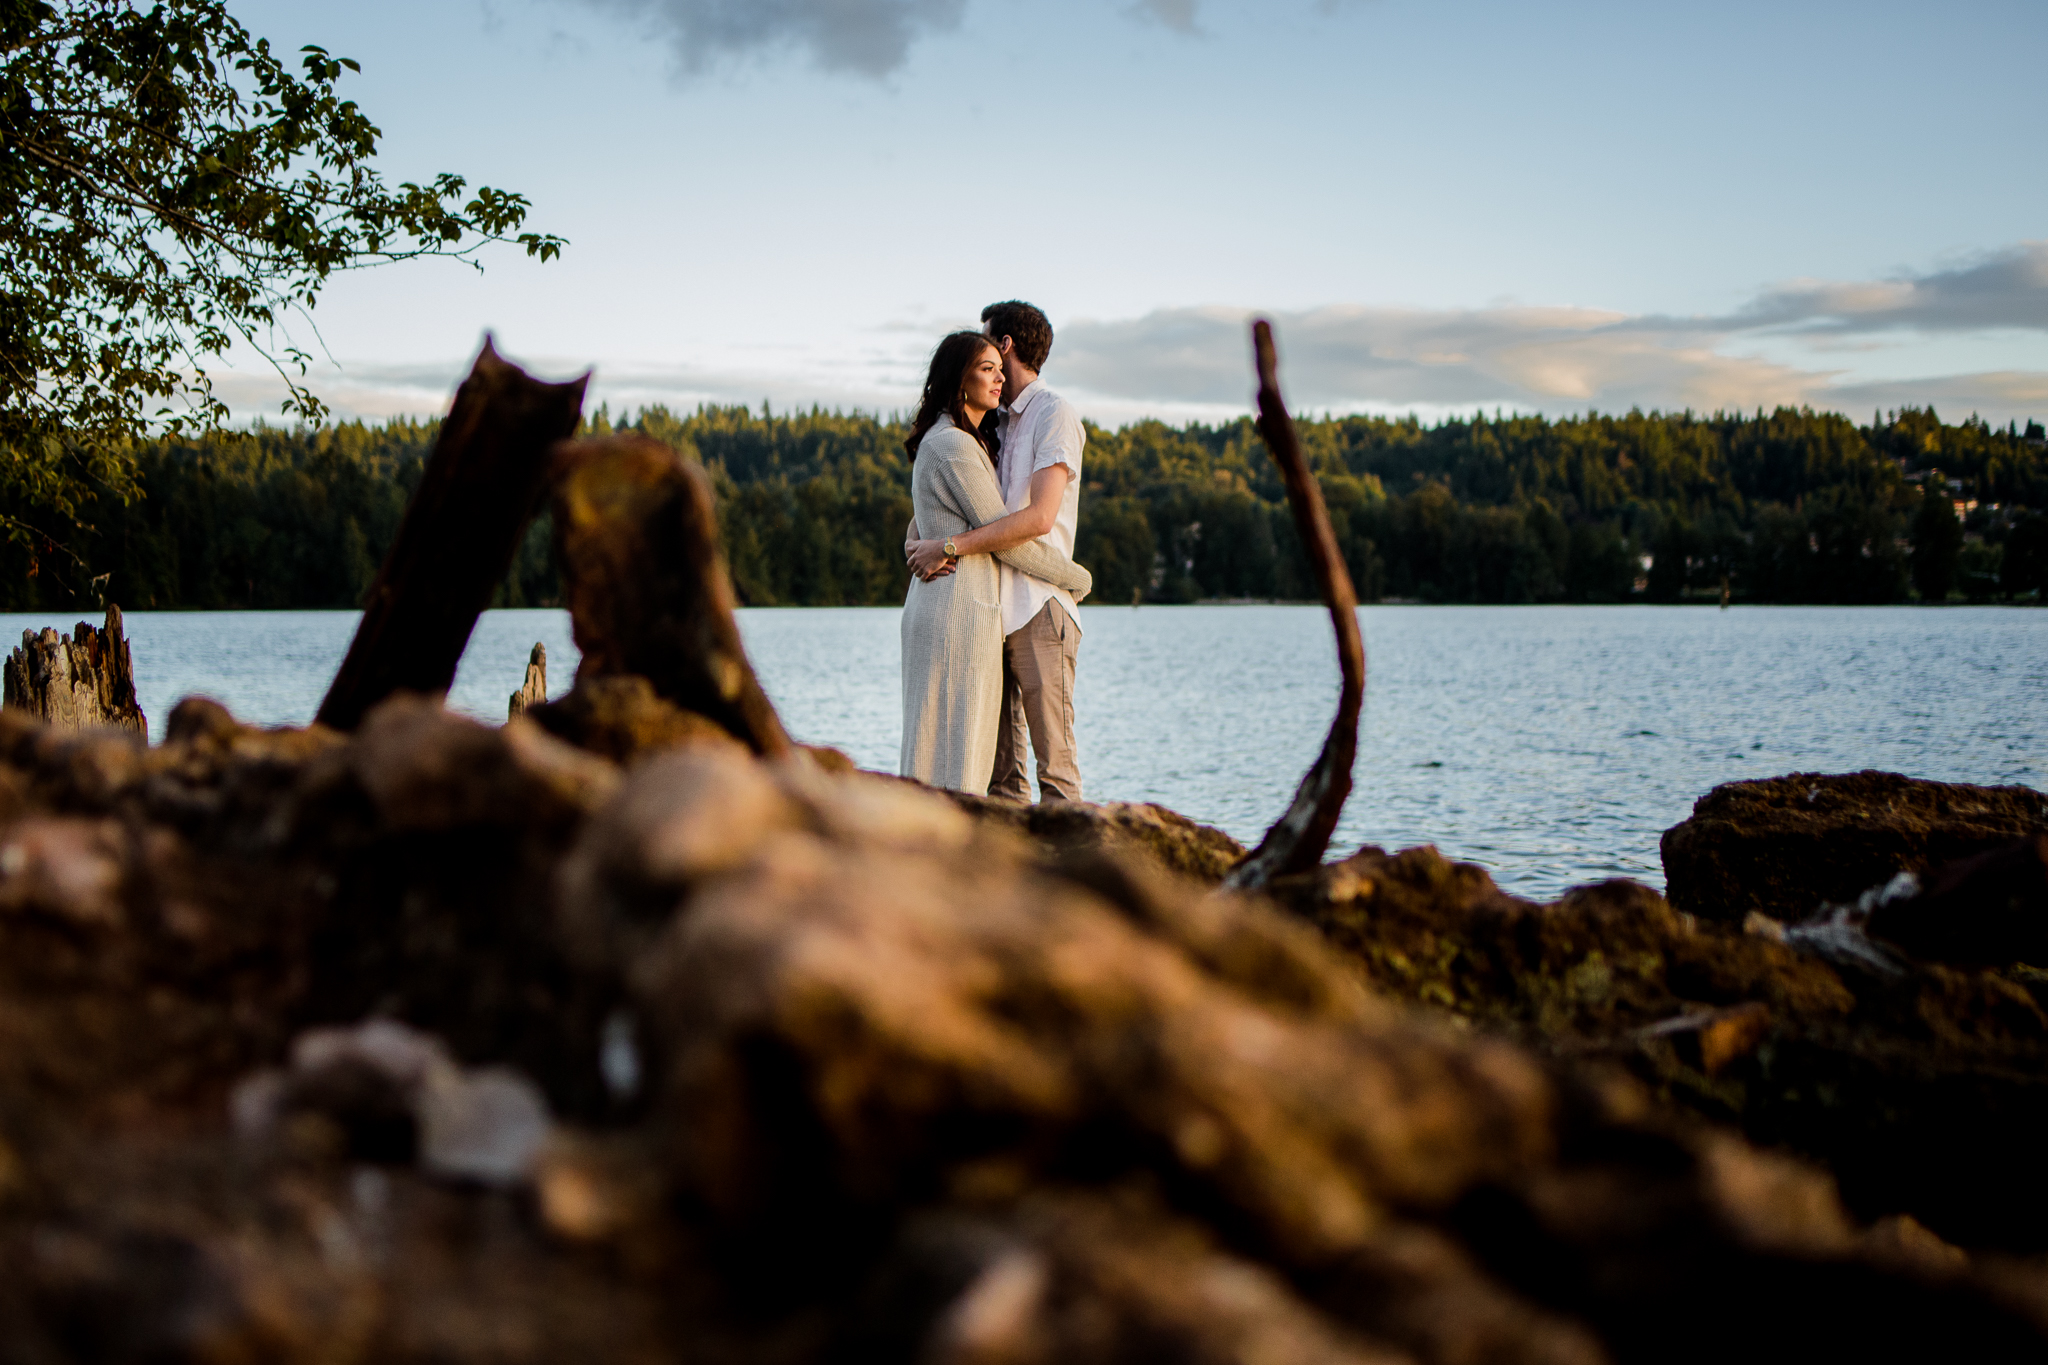 Photo of Buntzen Lake Anmore British Columbia Landscape Best Fun Engagement Photographer Port Moody Wedding Sunset Romantic Couple Photos 181.jpg